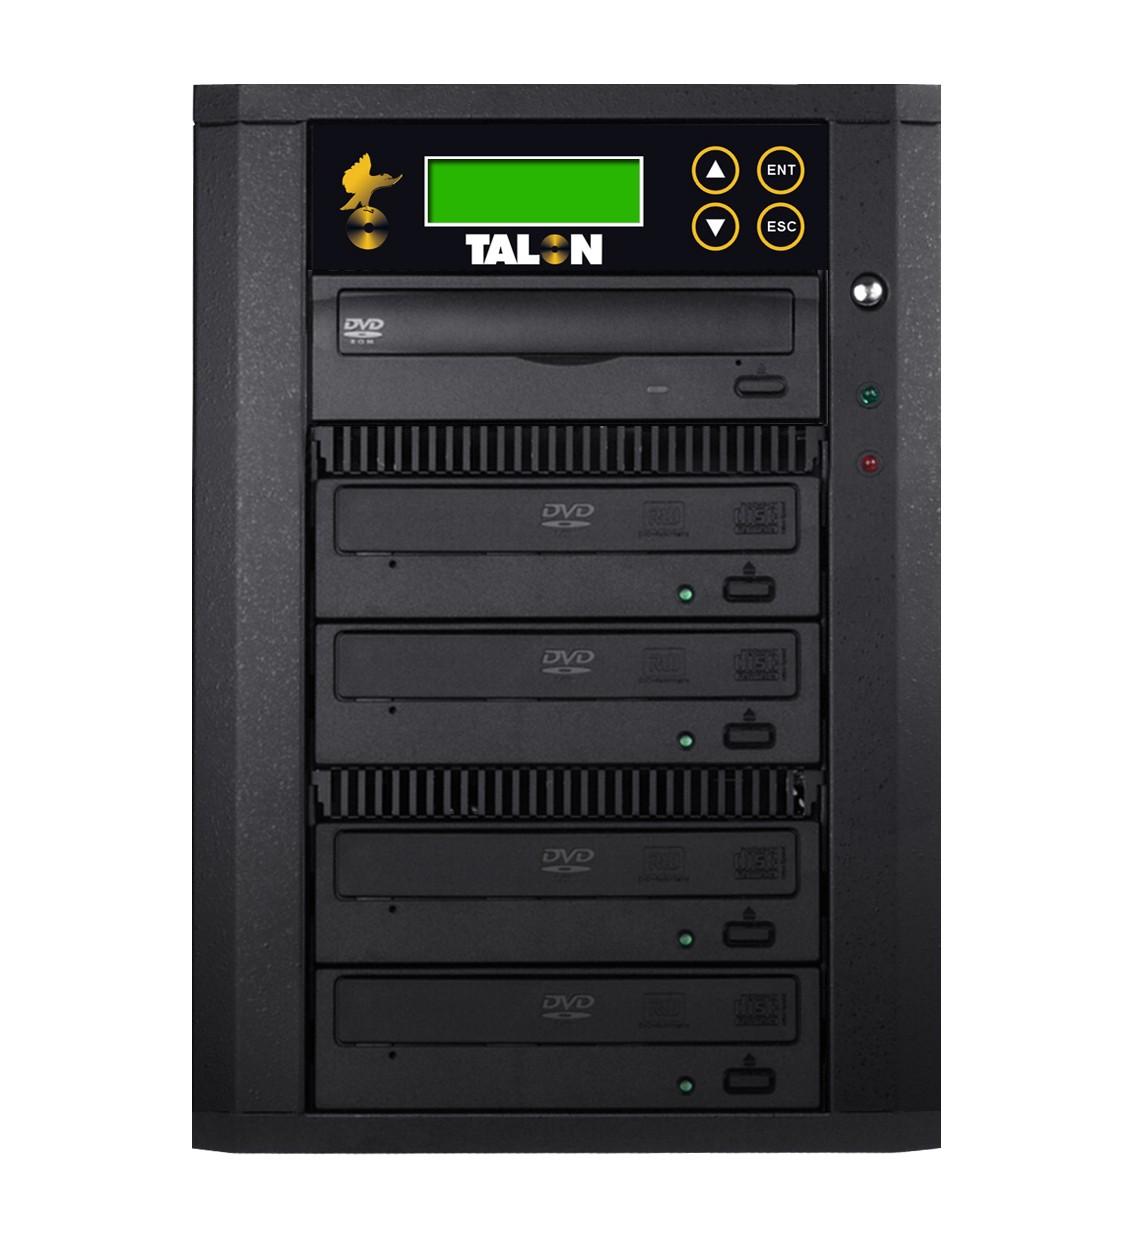 Talon 4 Drive DVD/CD Duplicator